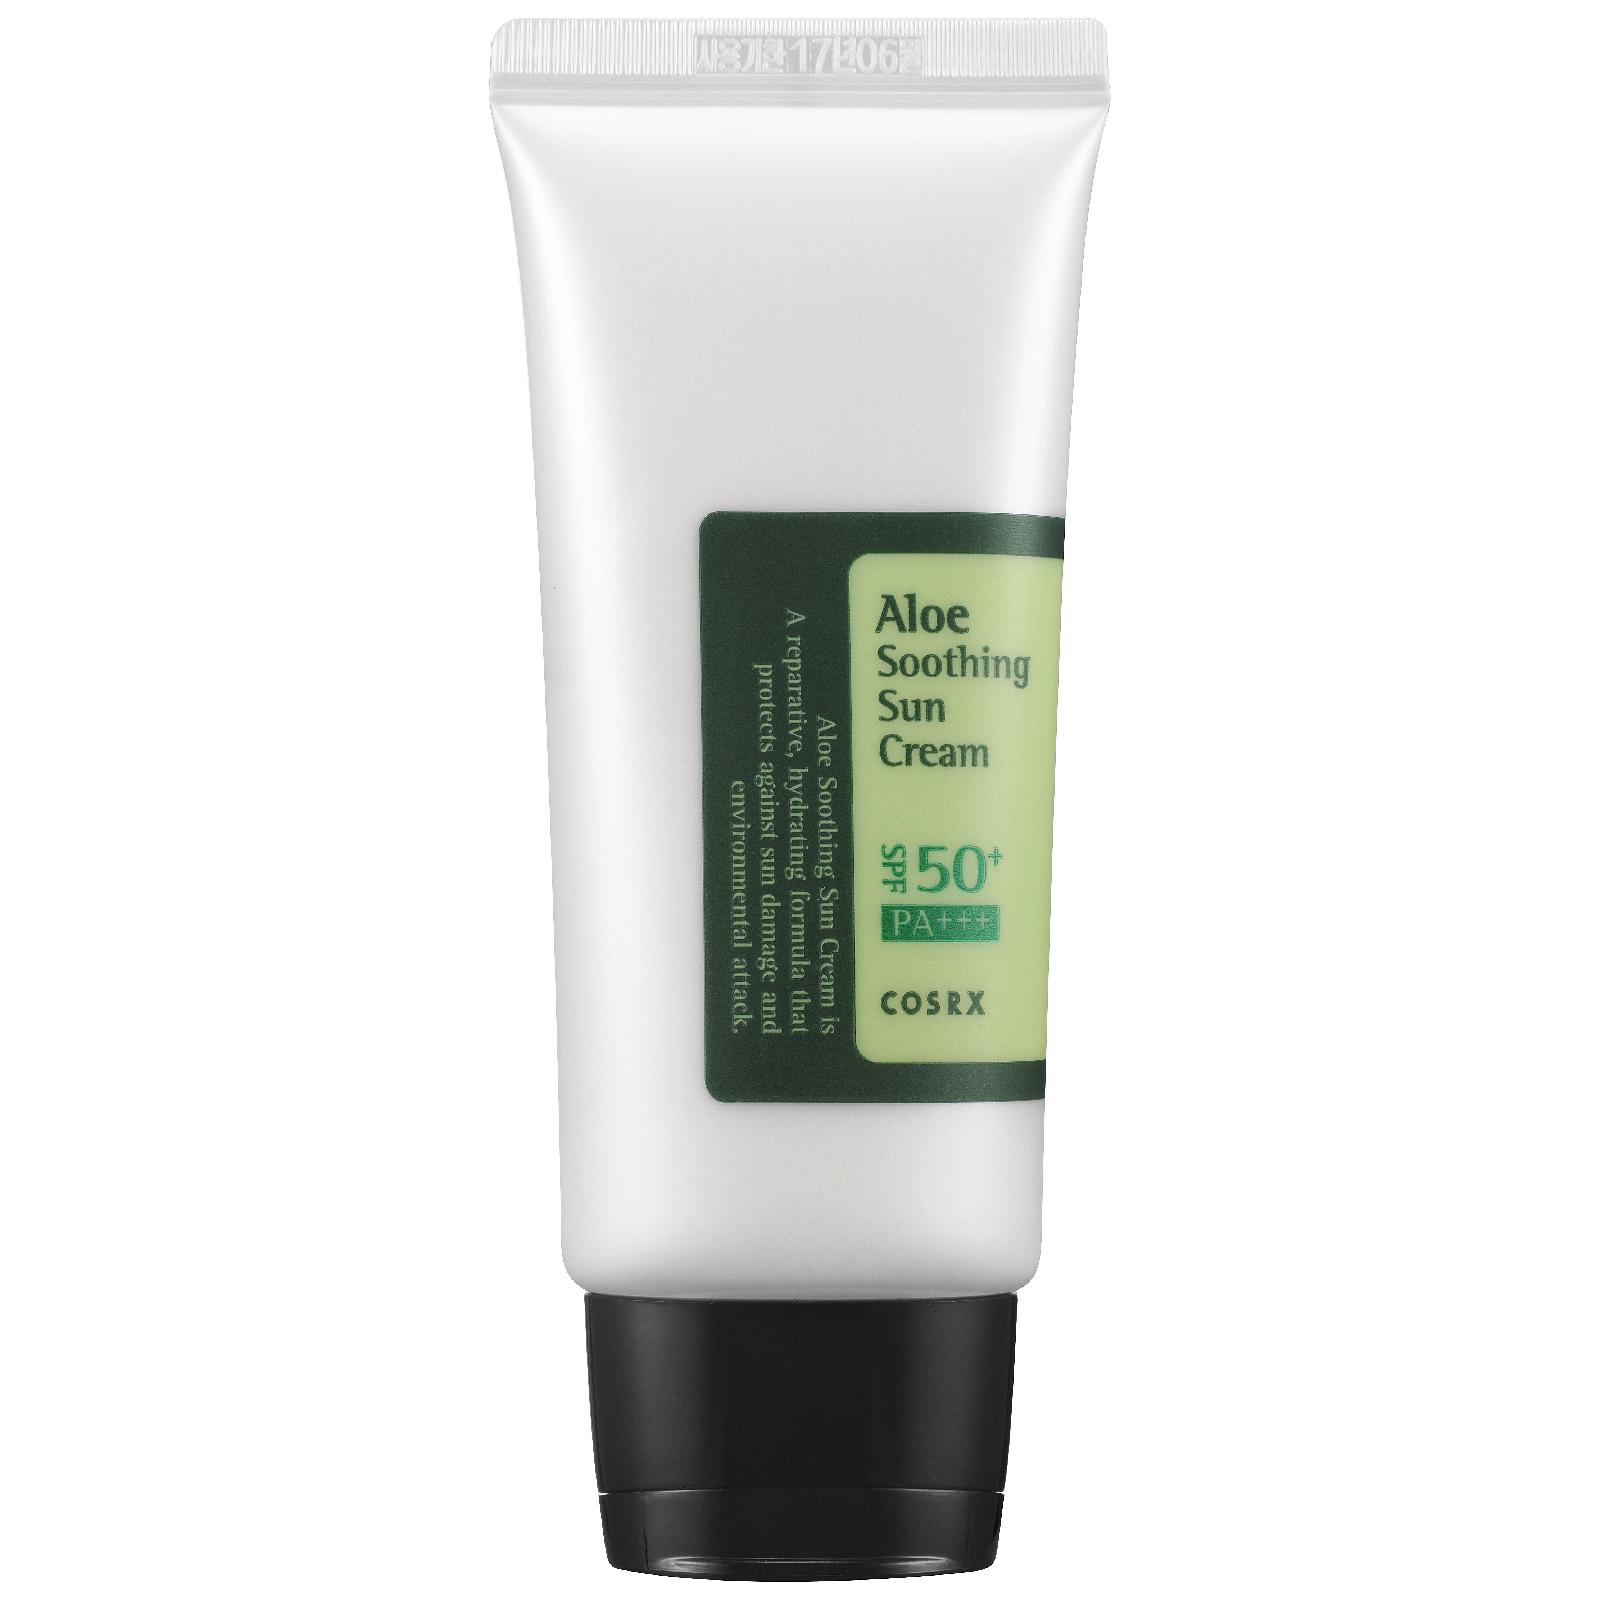 COSRX Aloe Soothing SPF50 PA+++ Sun Cream 50ml